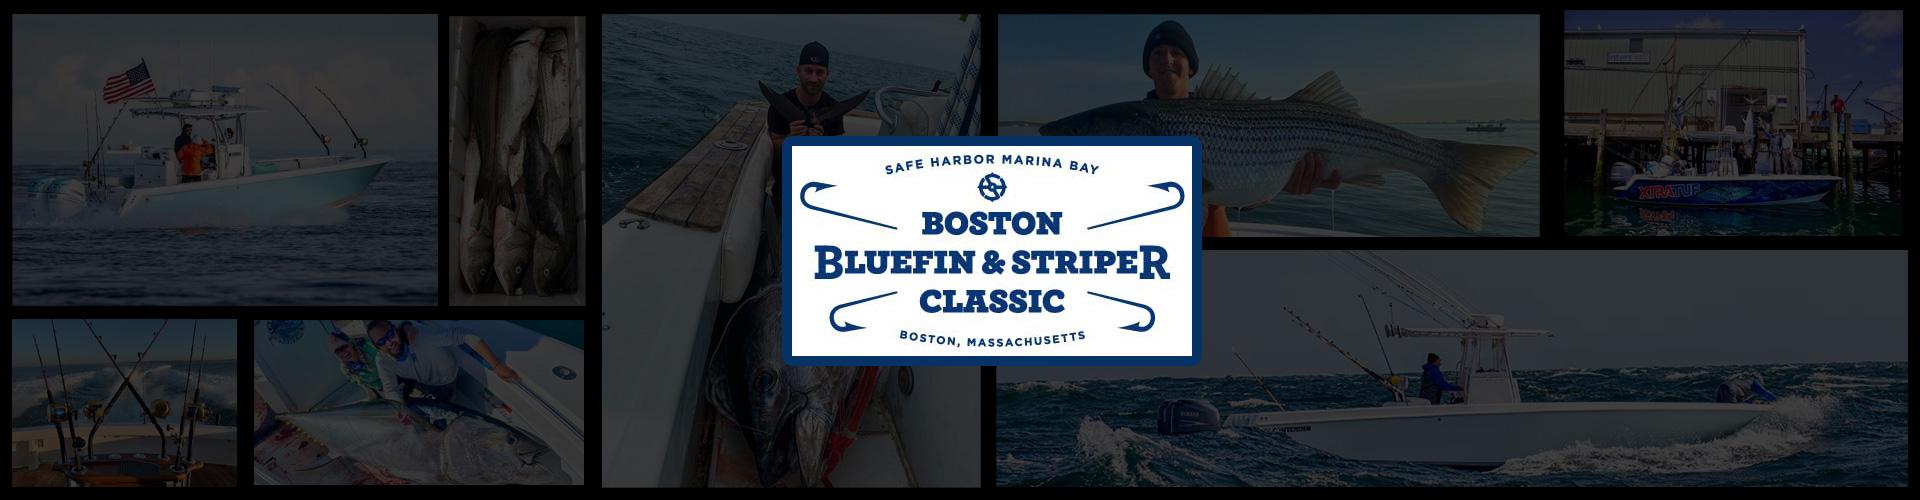 2021 Boston Bluefin and Striper Classic Live Scoring by CatchStat.com